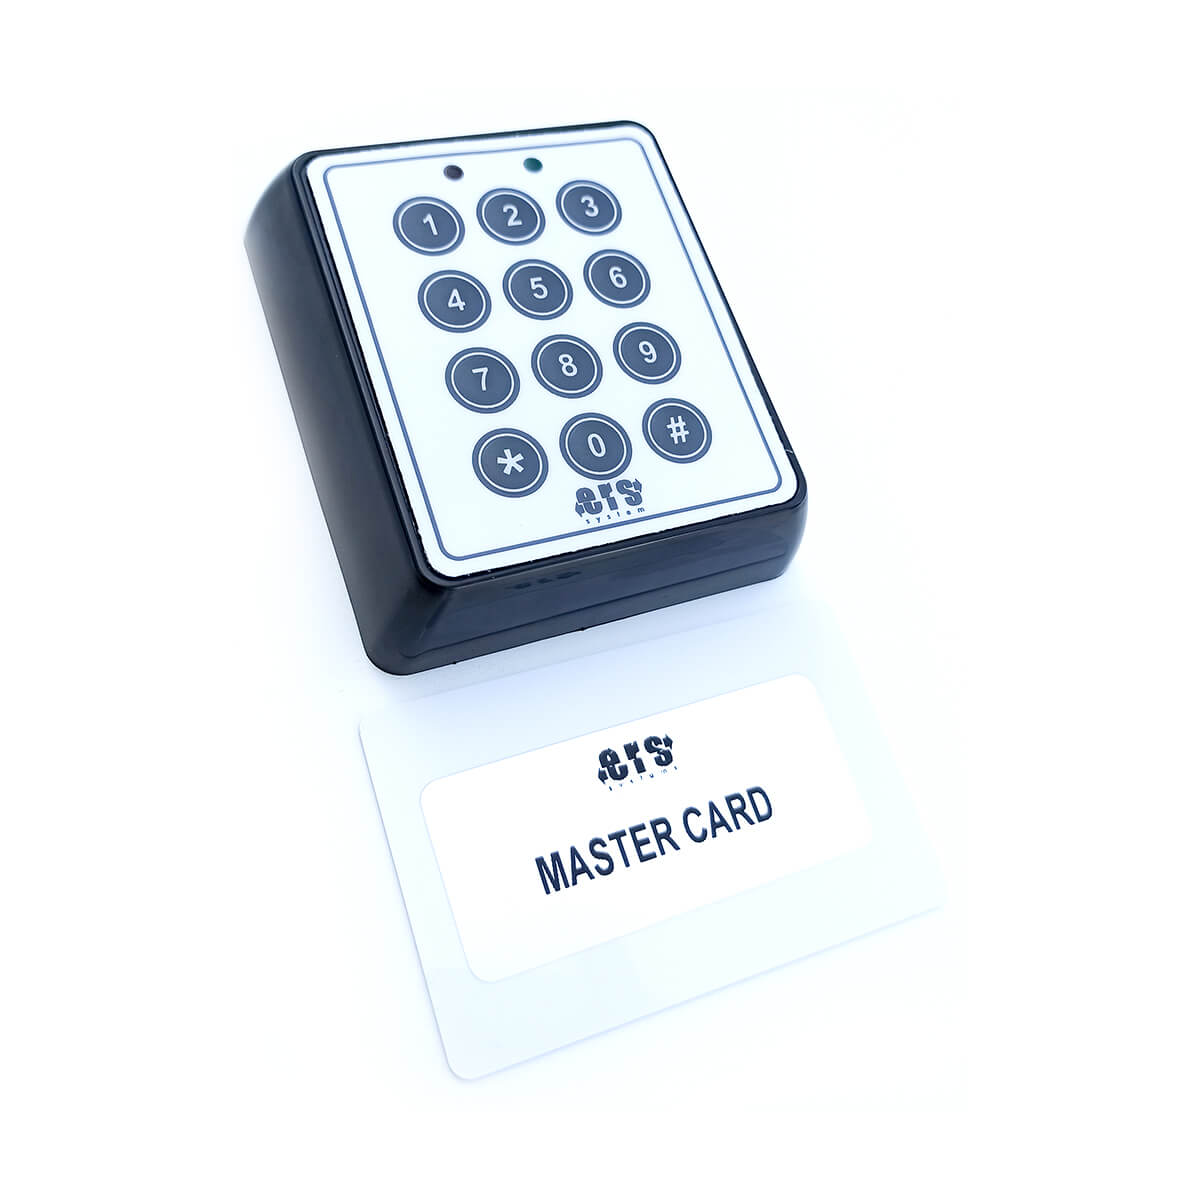 Keypad With Ingtegrated Card Reader